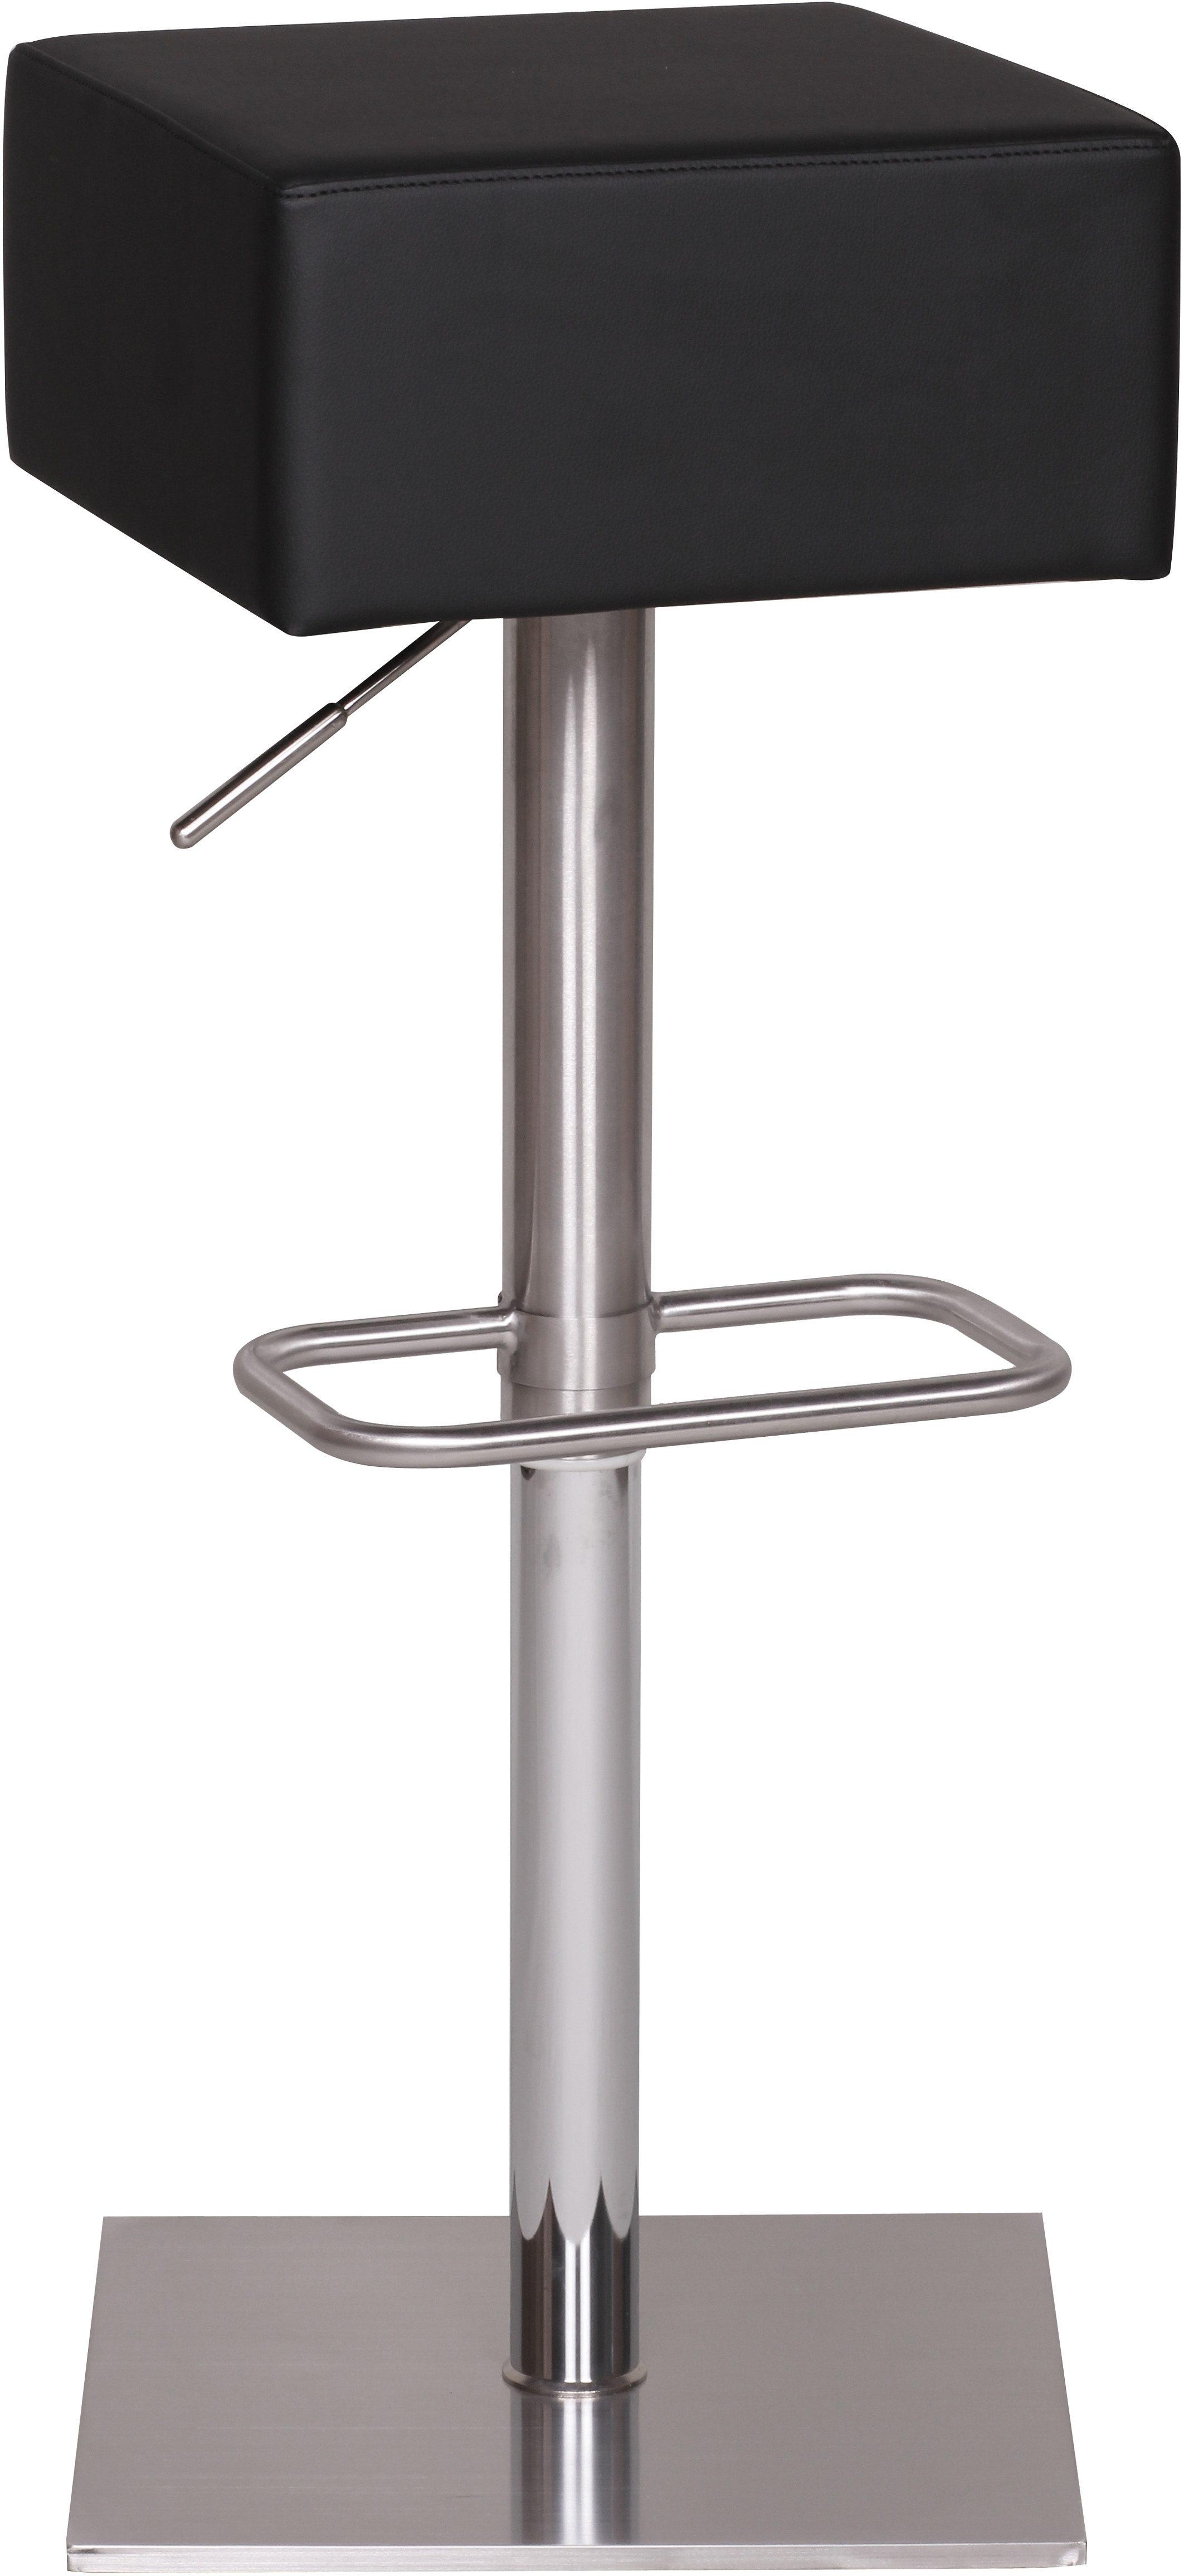 Wohnling, Barhocker Durable M4